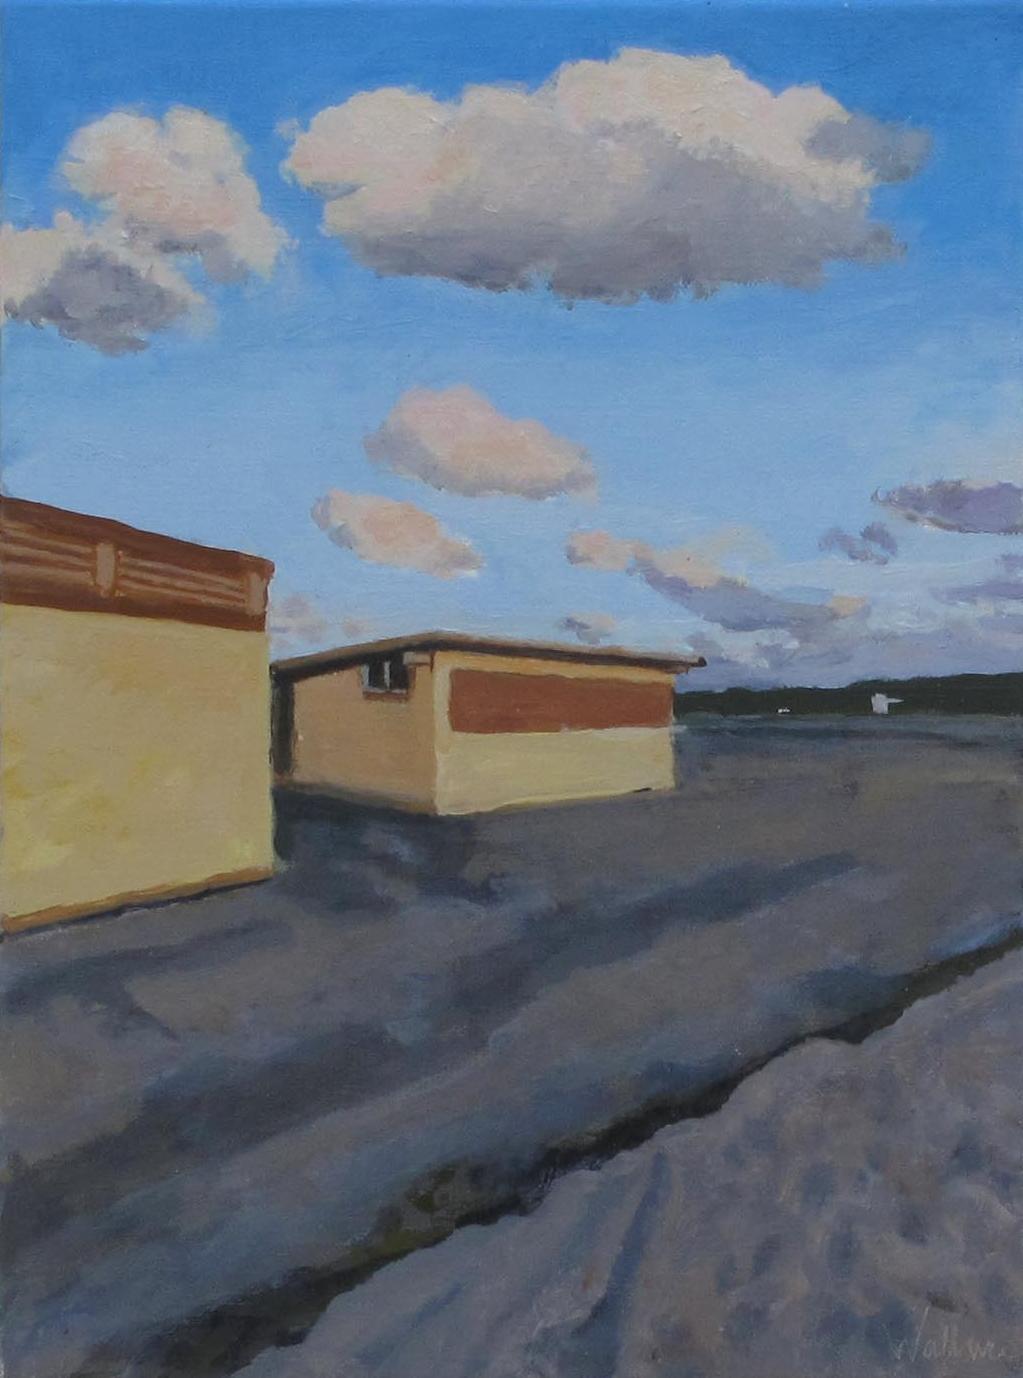 "Herring Cove '09, Oil on Canvas, 8x10"""